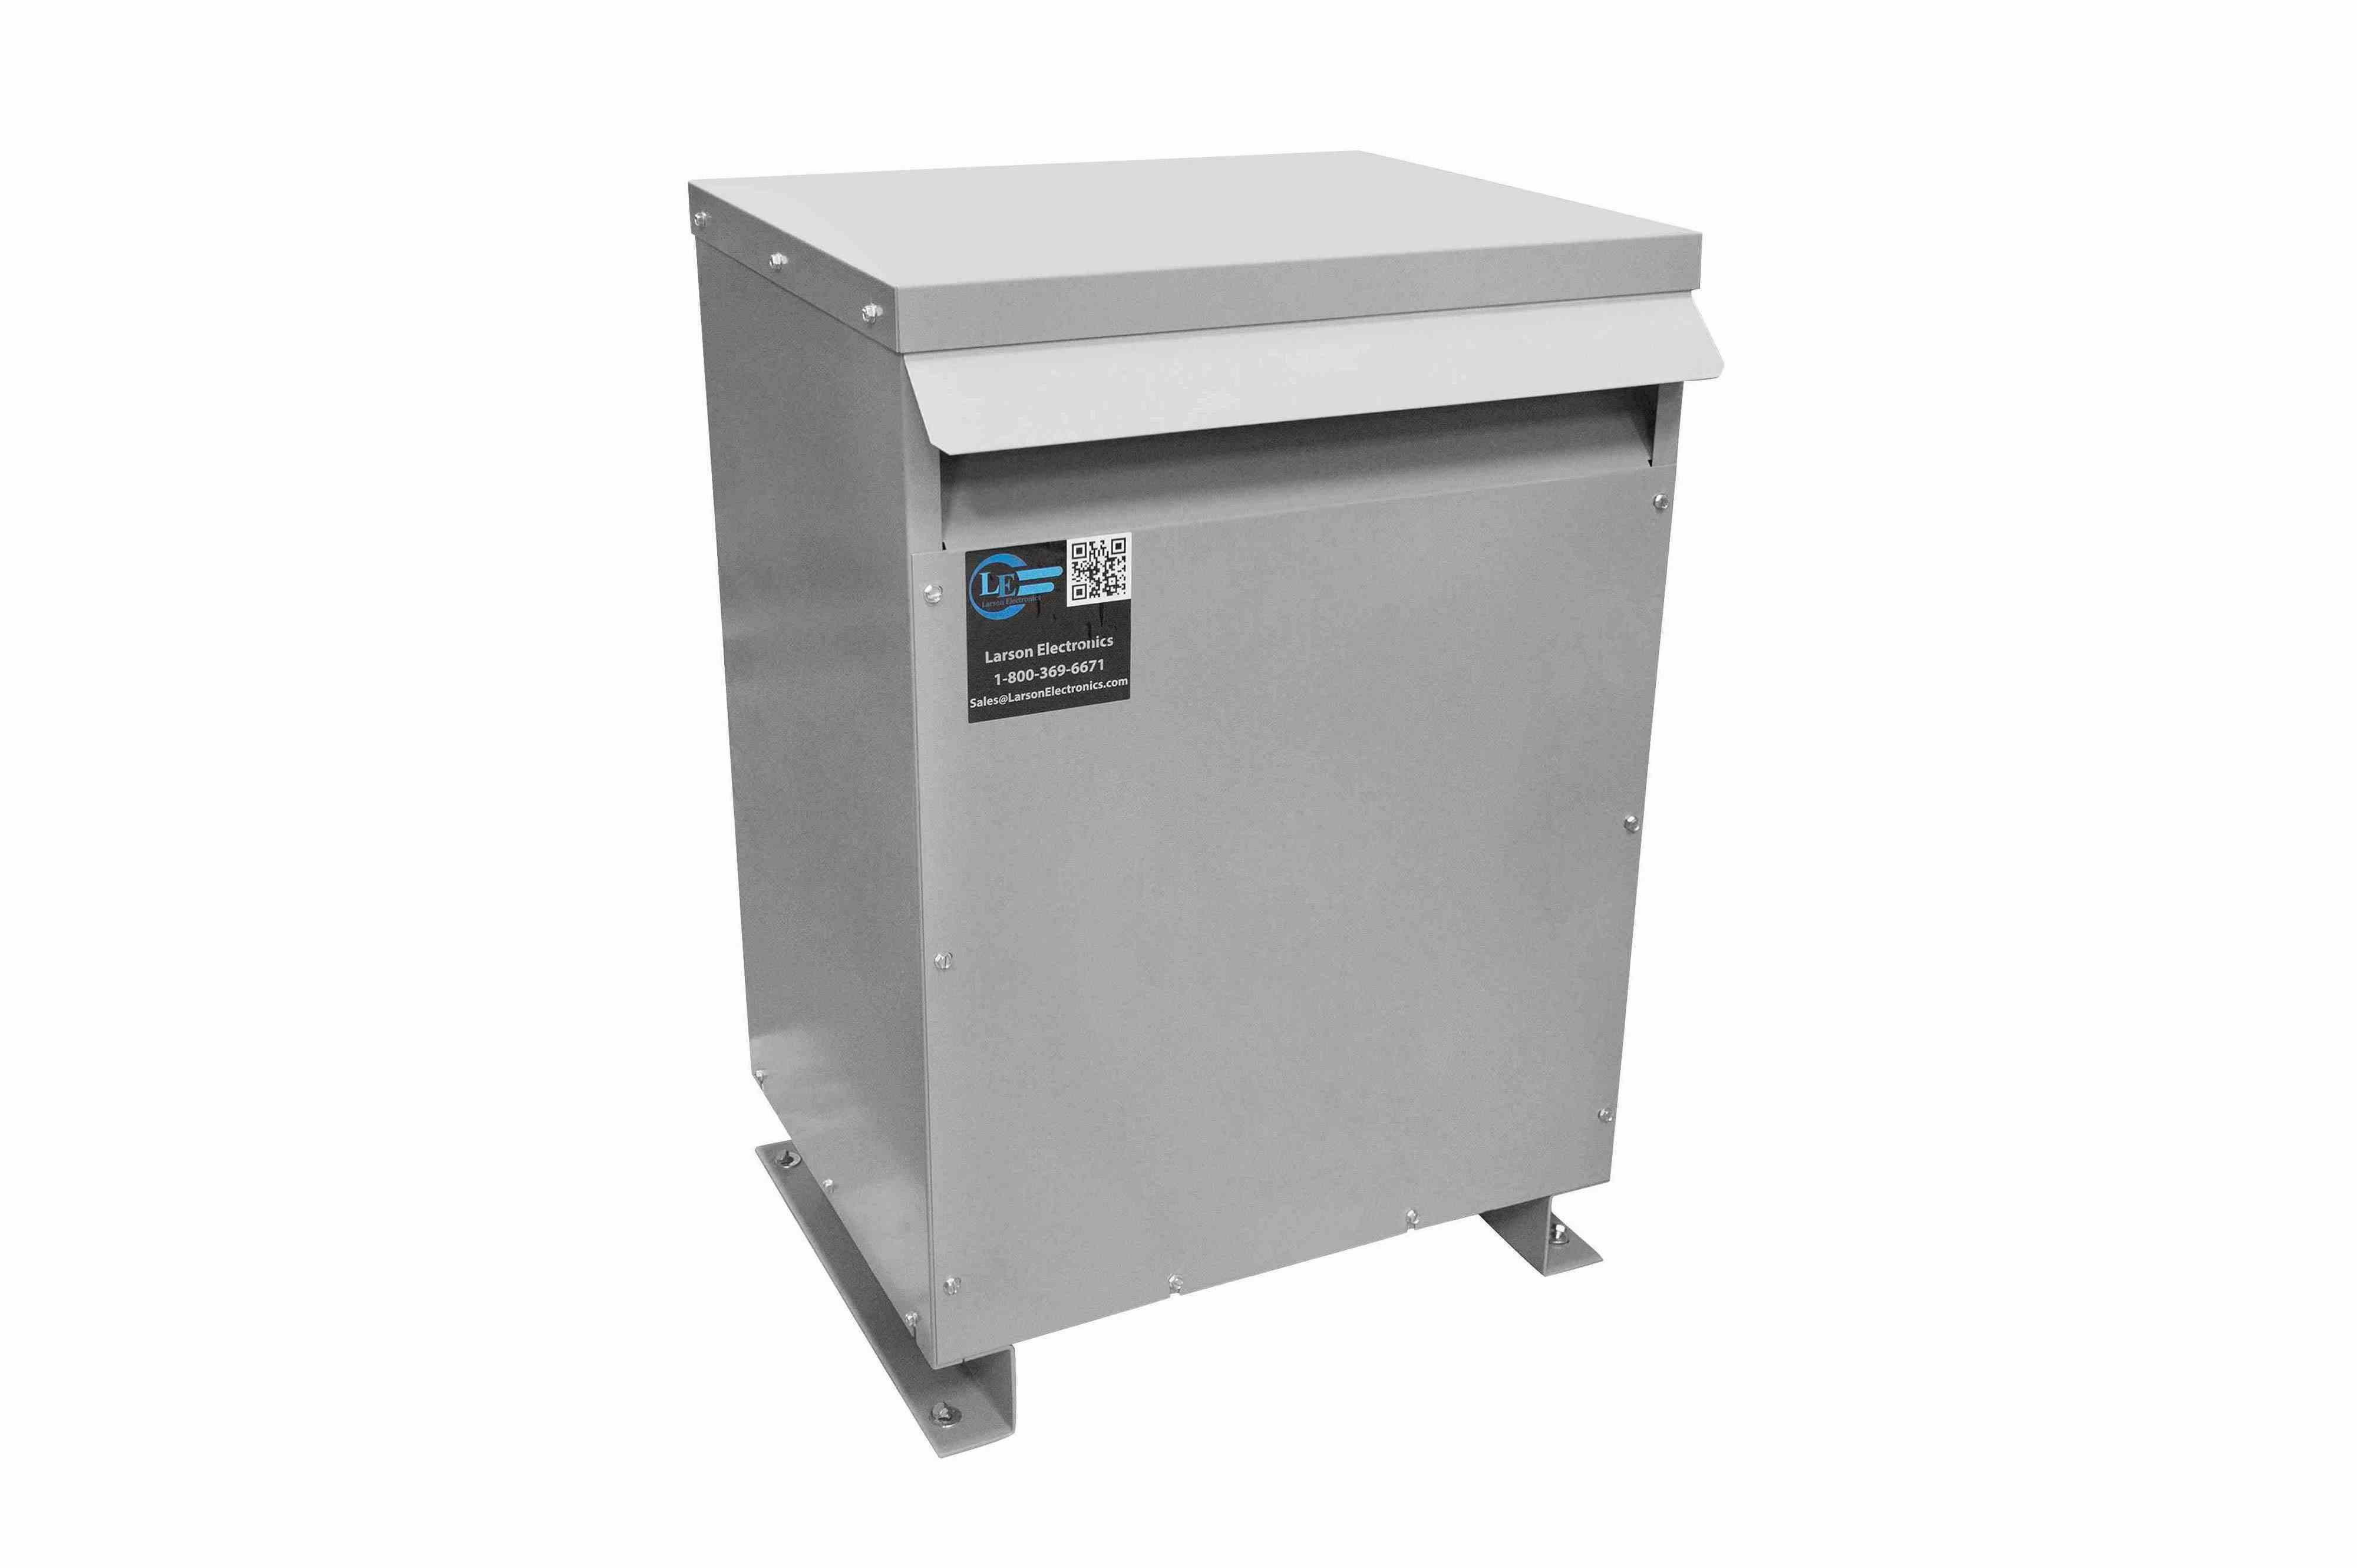 150 kVA 3PH Isolation Transformer, 380V Wye Primary, 208Y/120 Wye-N Secondary, N3R, Ventilated, Copper Windings, 50/60 Hz